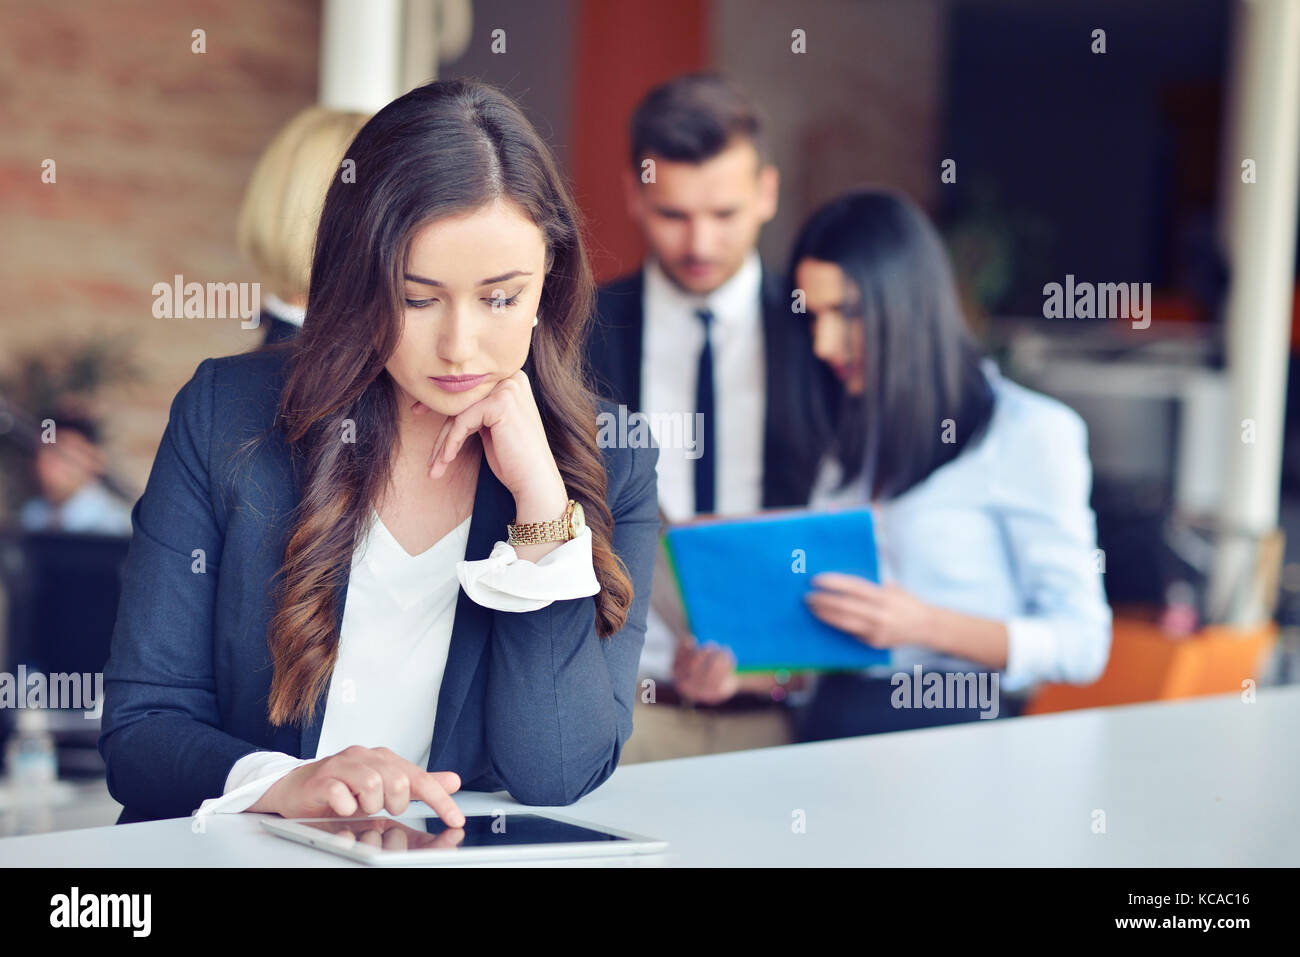 Schöne Brünette mit Notebook im Cafe Stockbild